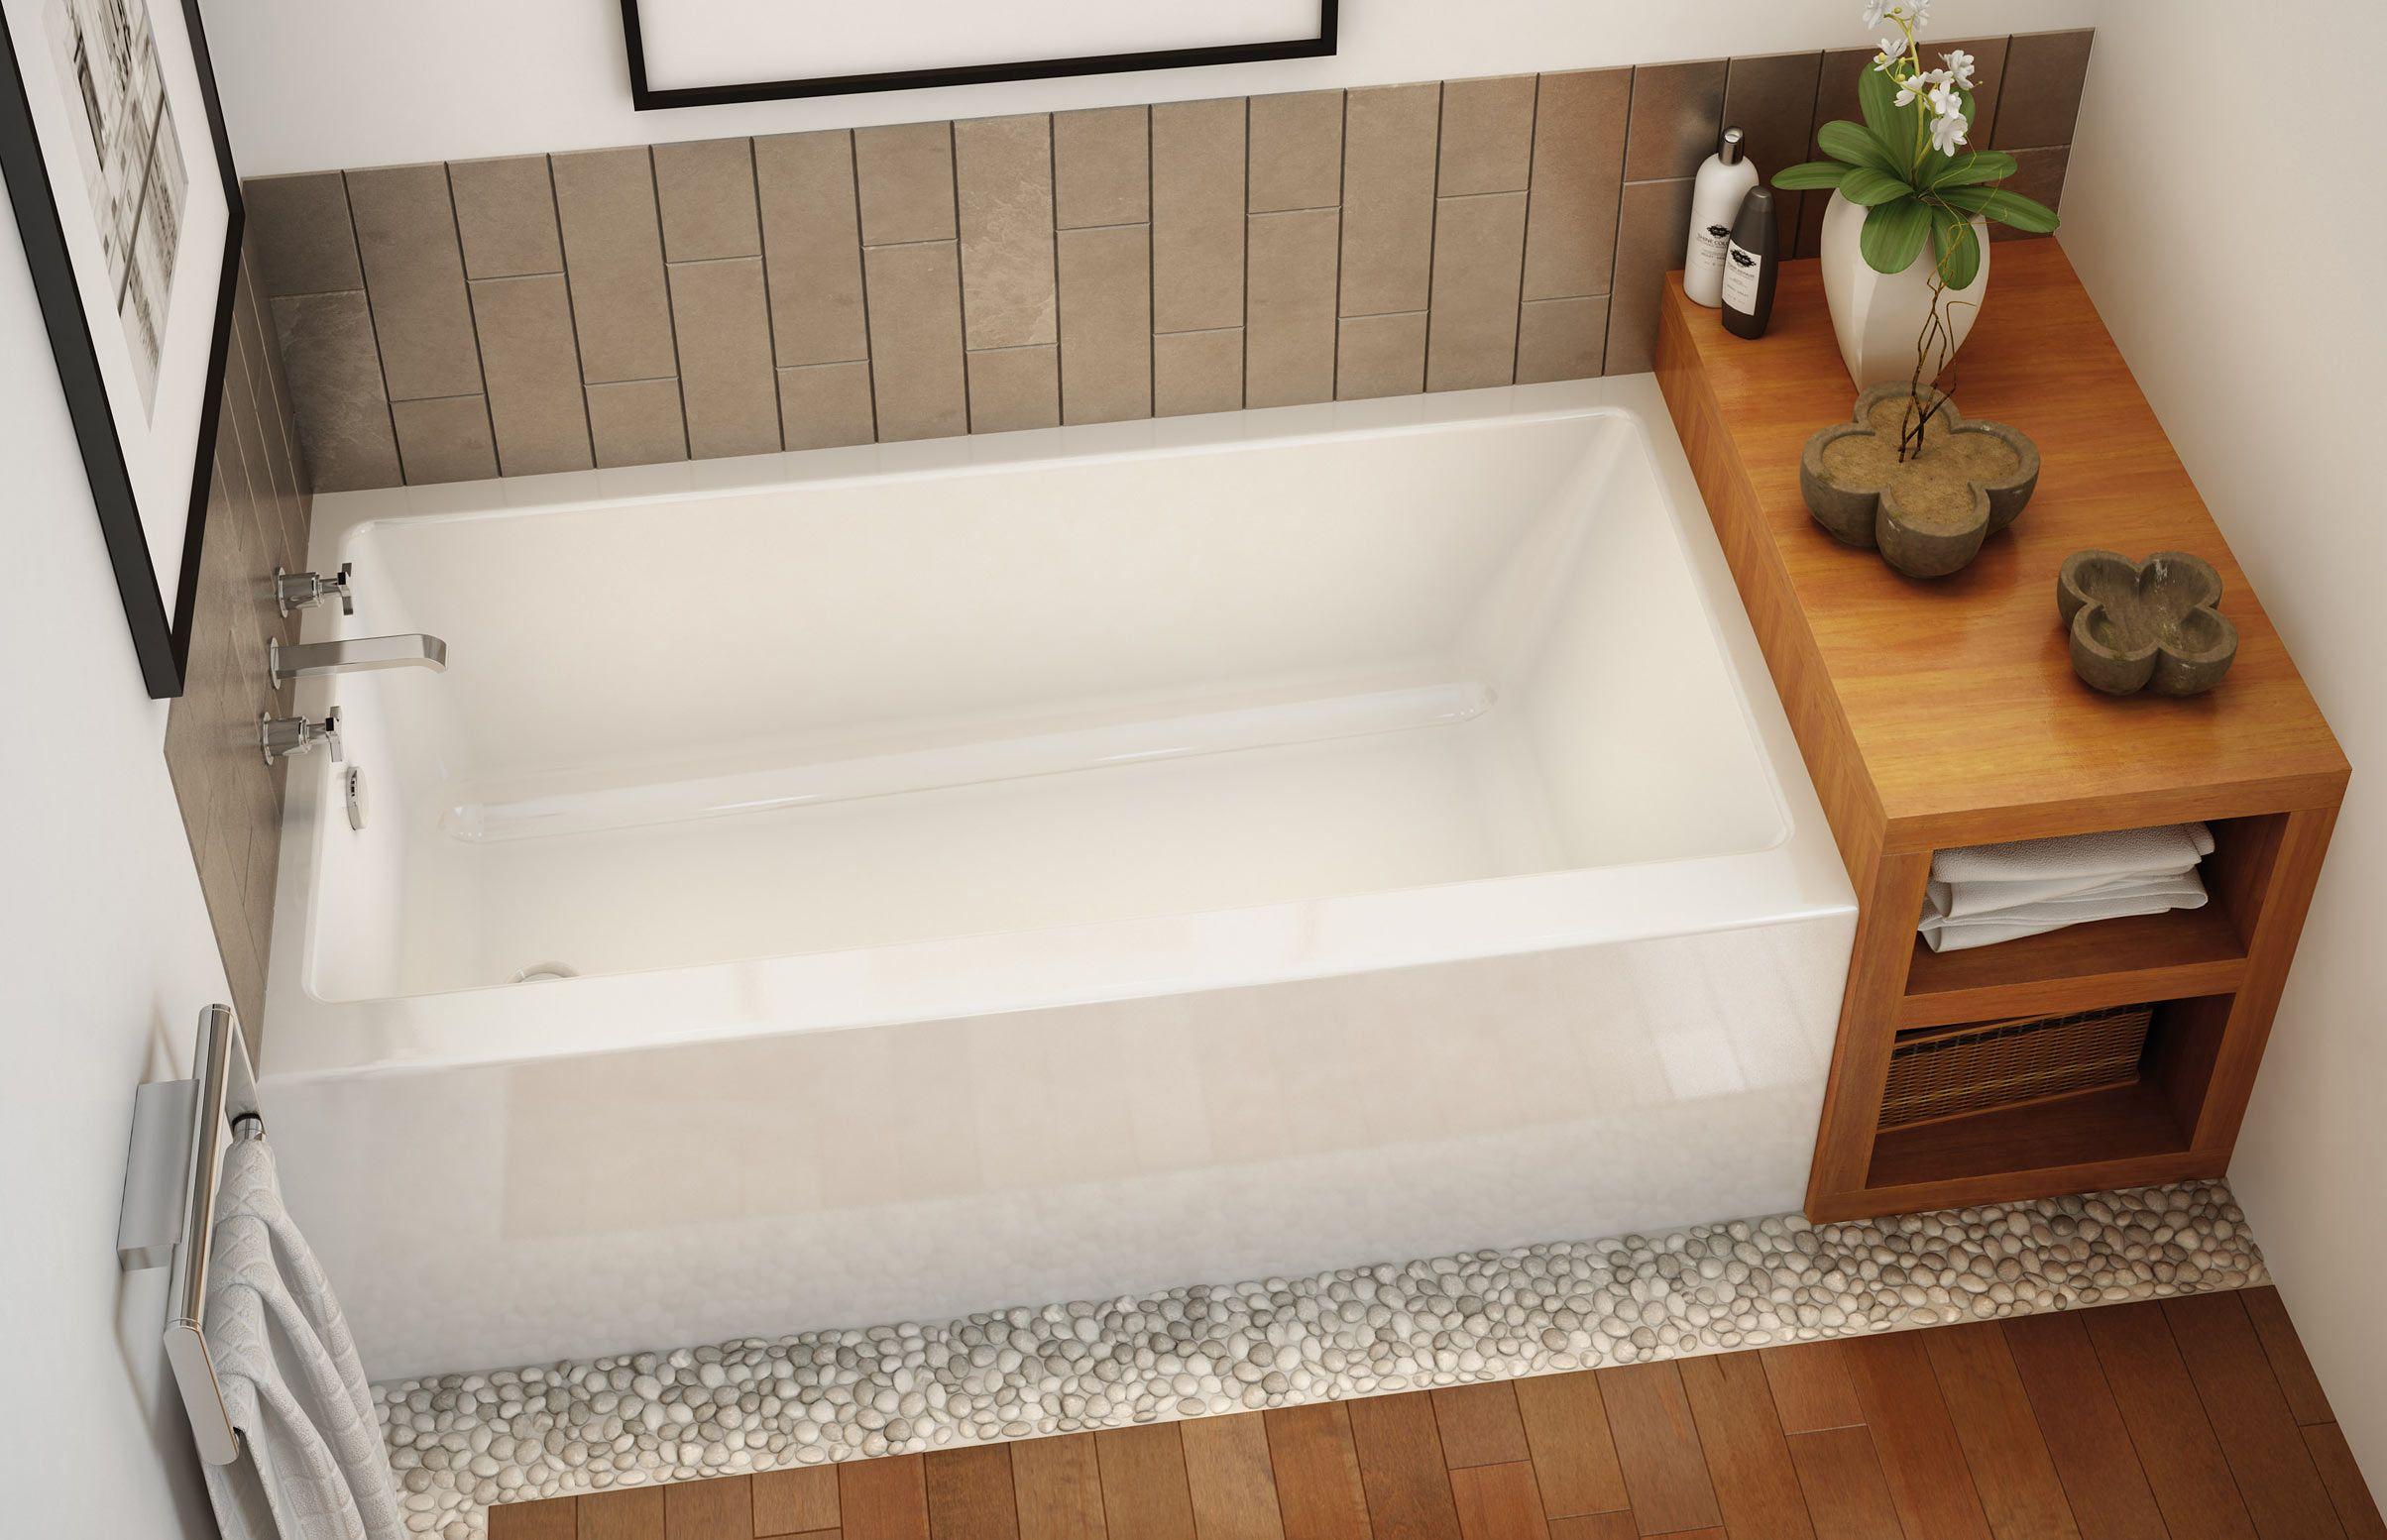 Maax professional rubix 6030 6032 alcove bathtub 60 x30 for Garden tub sizes